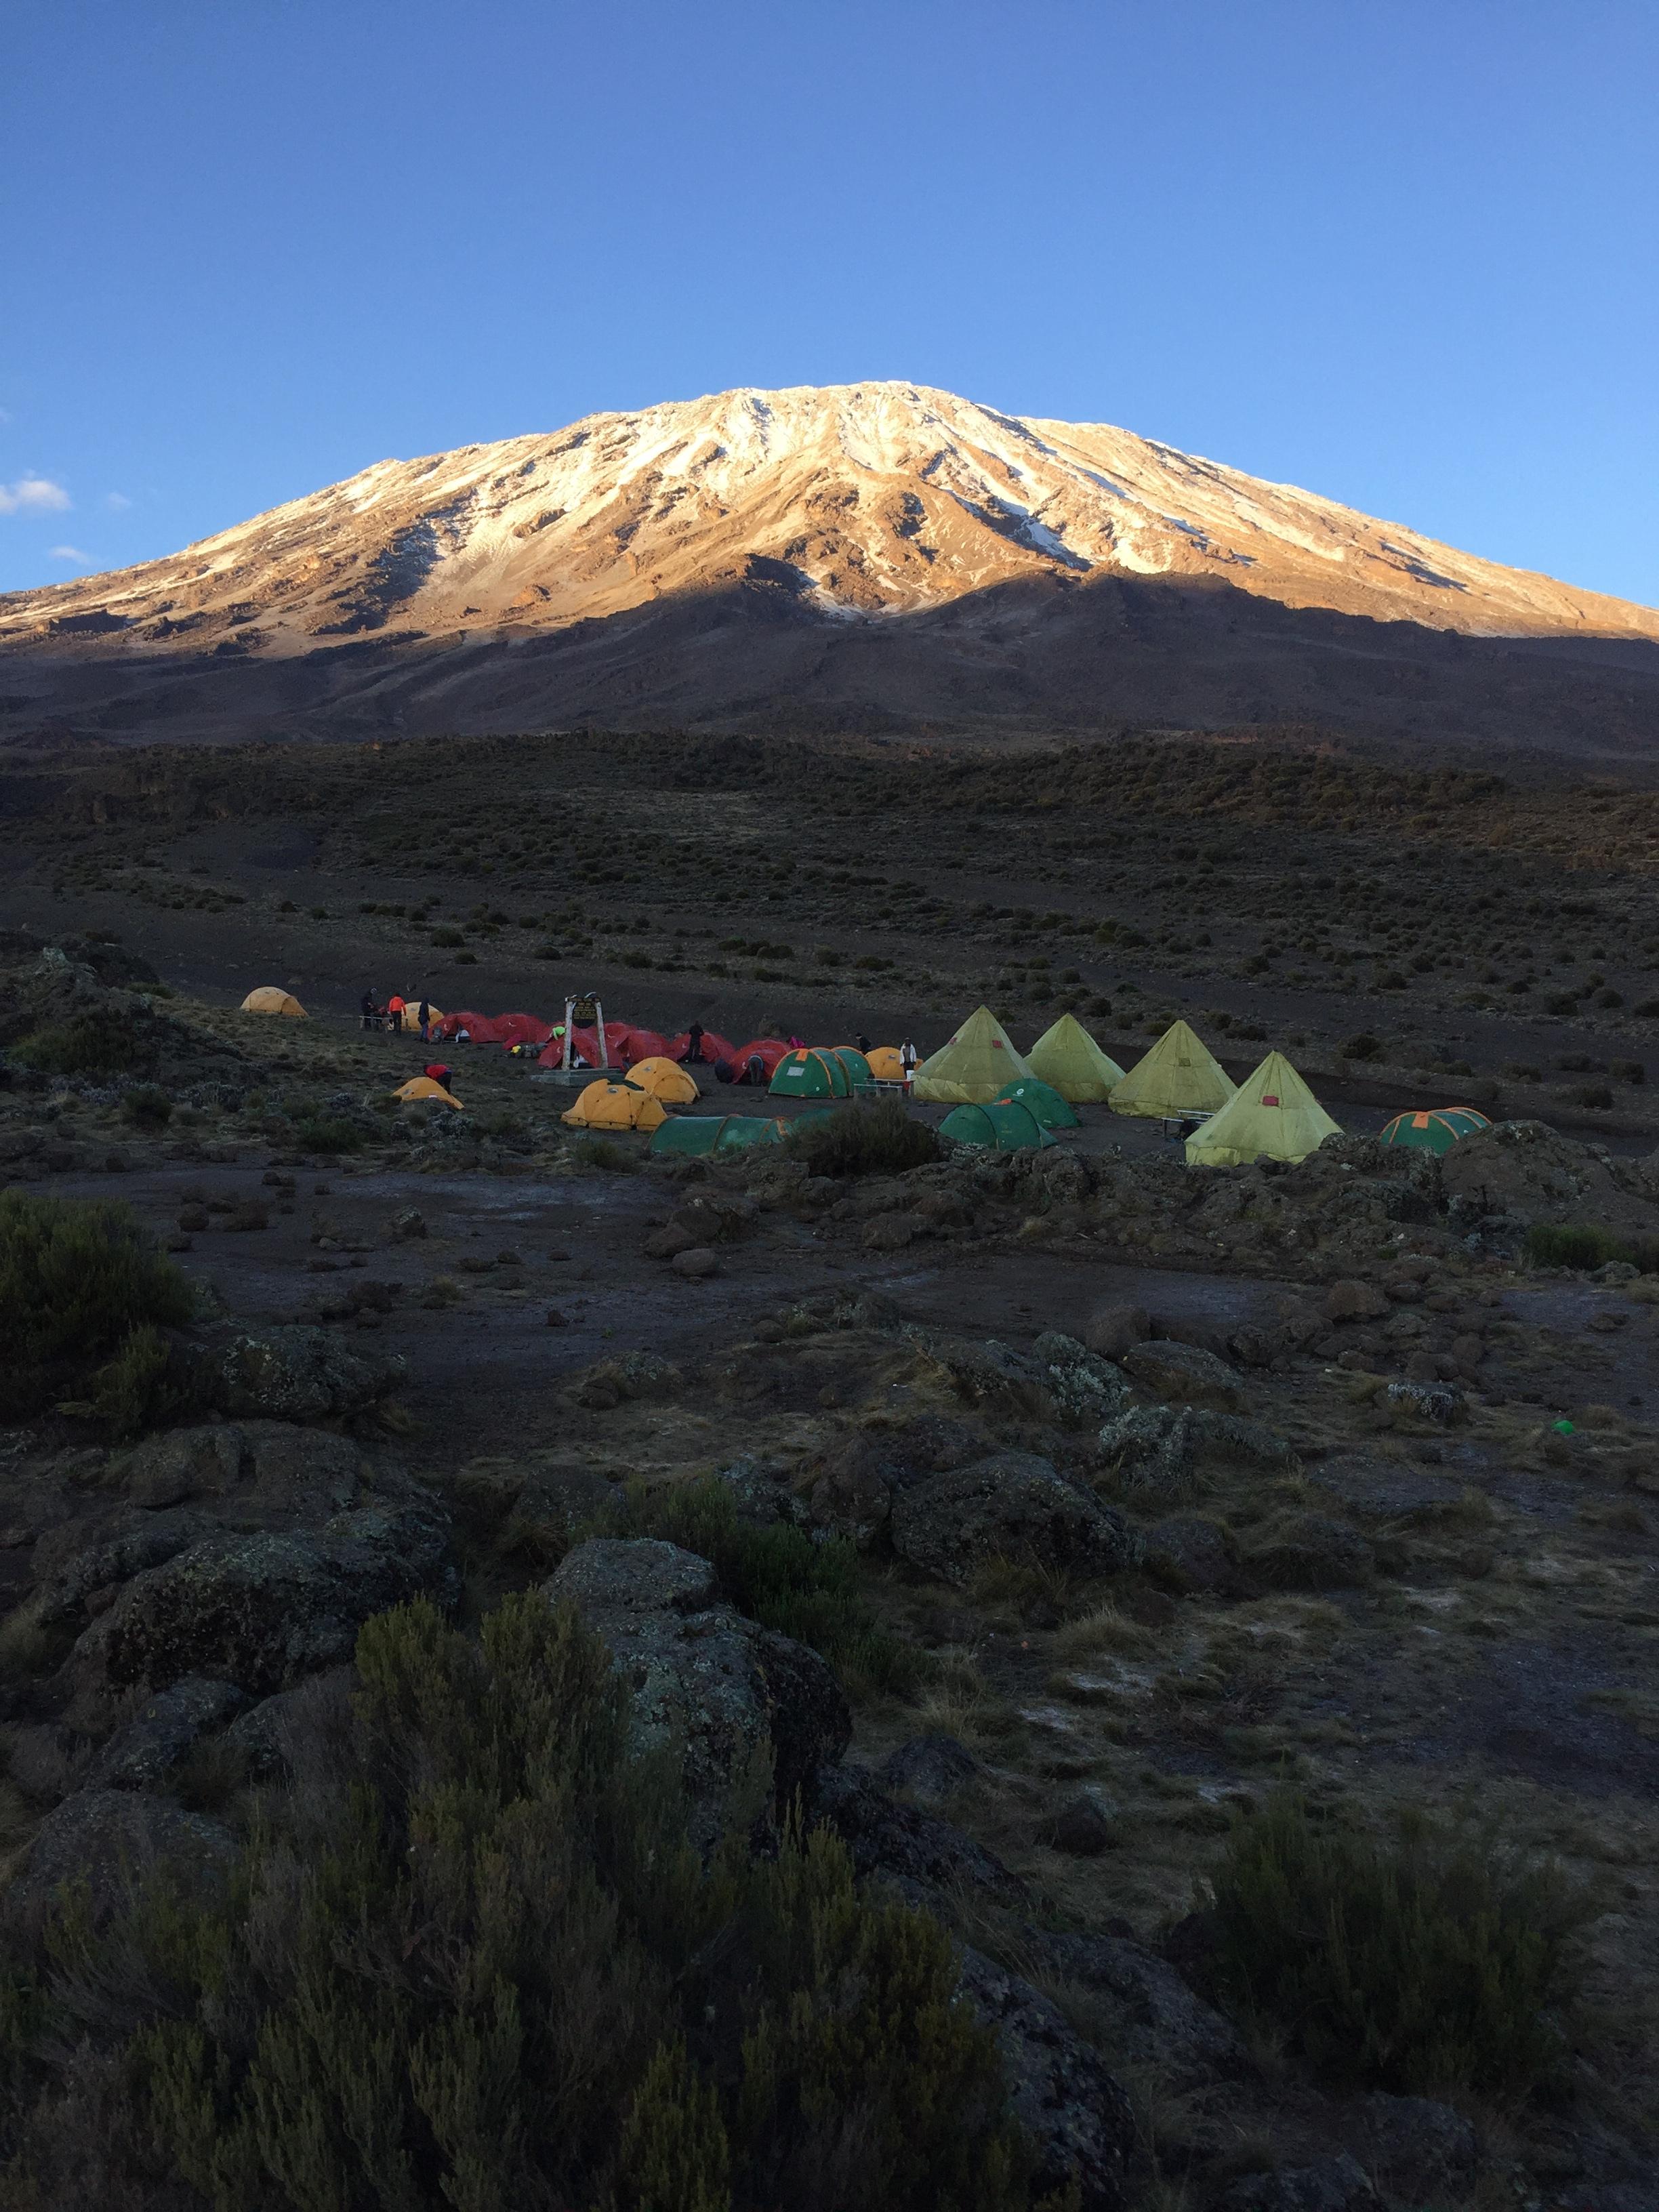 The main mountain that Uhuru Peak sits on top of is called Kibo.